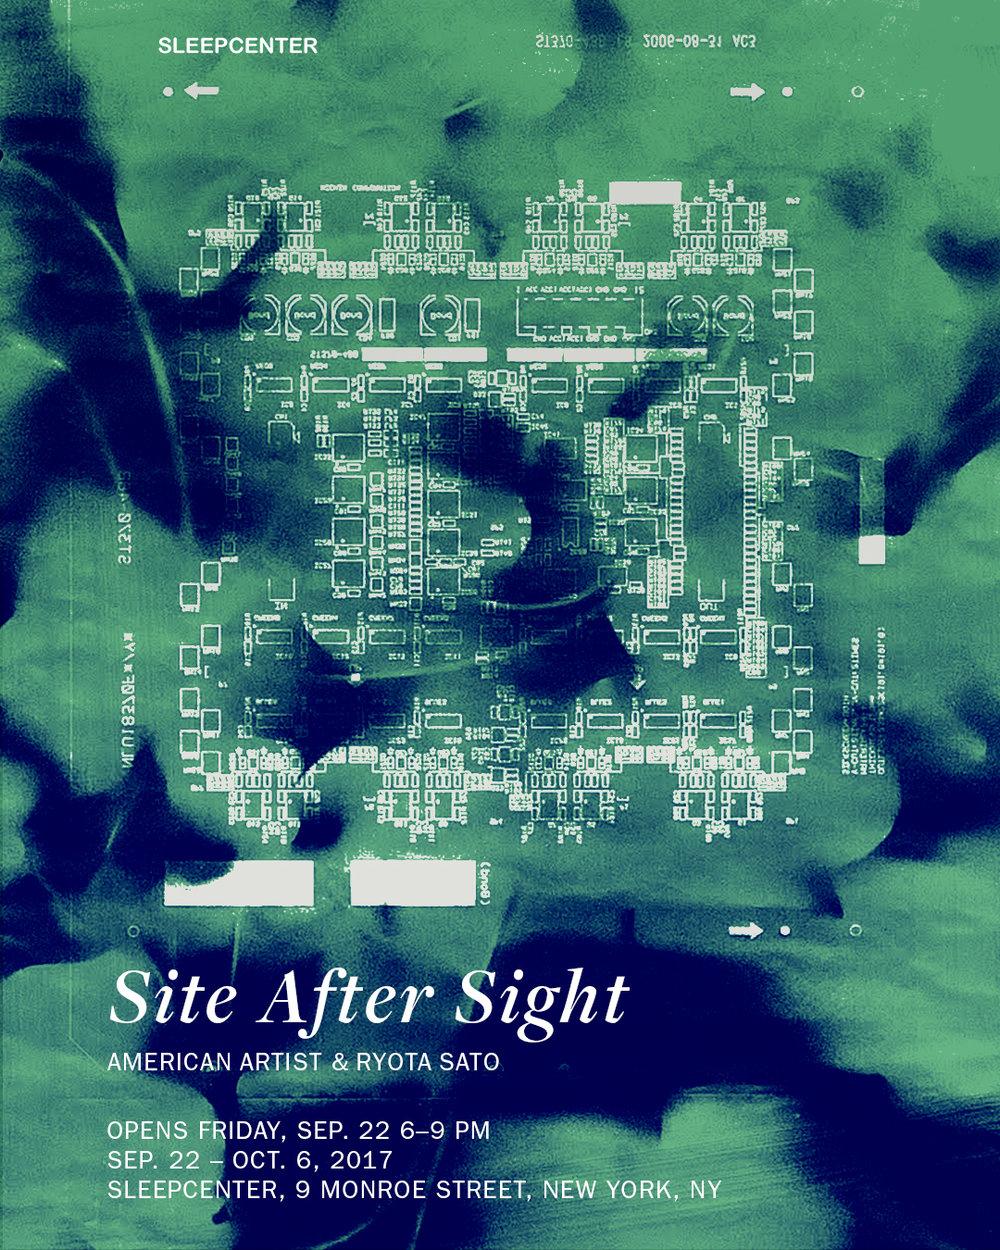 SiteAfterSight_PR_IG_0914.jpg